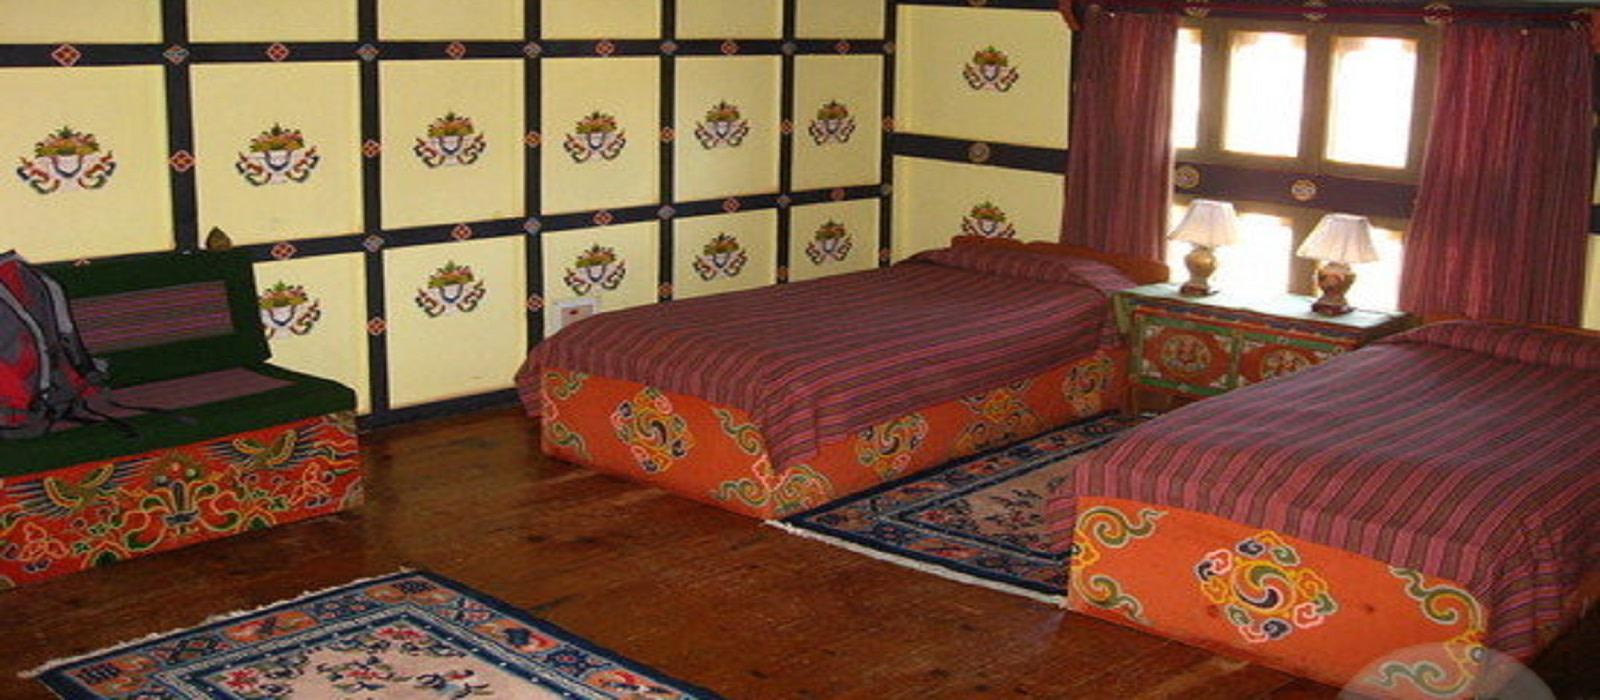 Hotel Gangtey Palace Bhutan